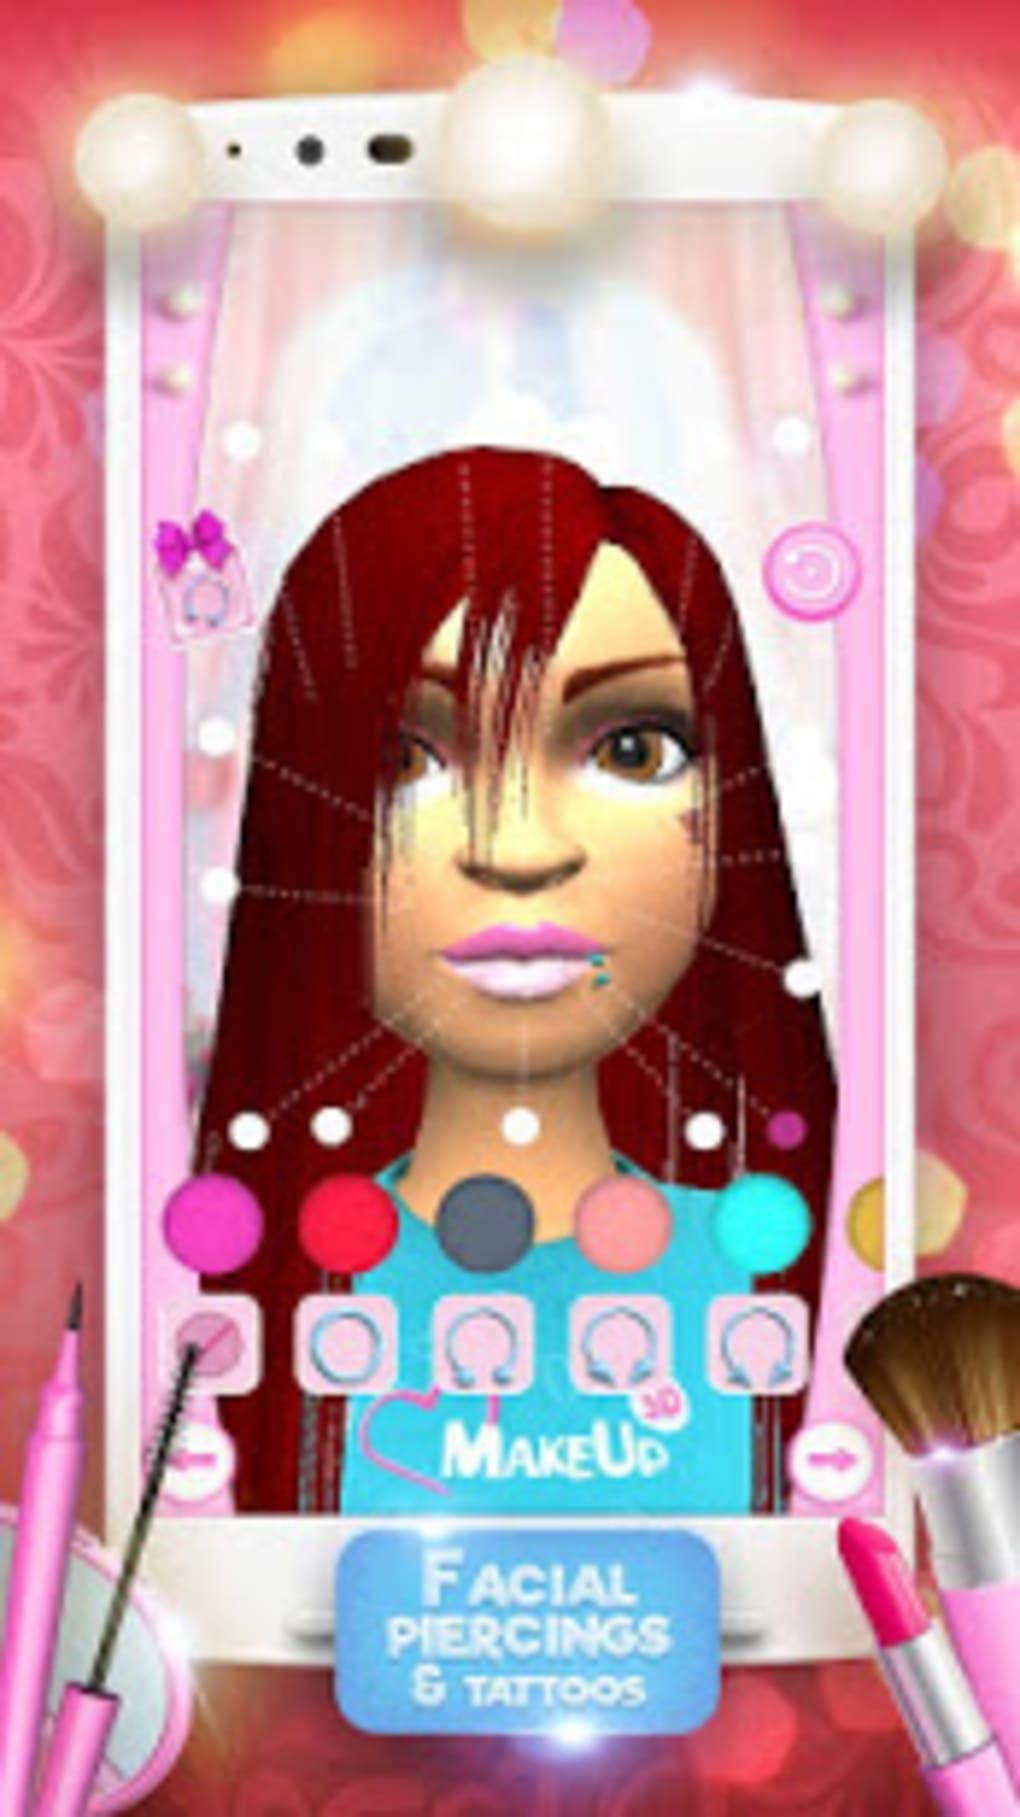 3D Makeup Games For Girls ...